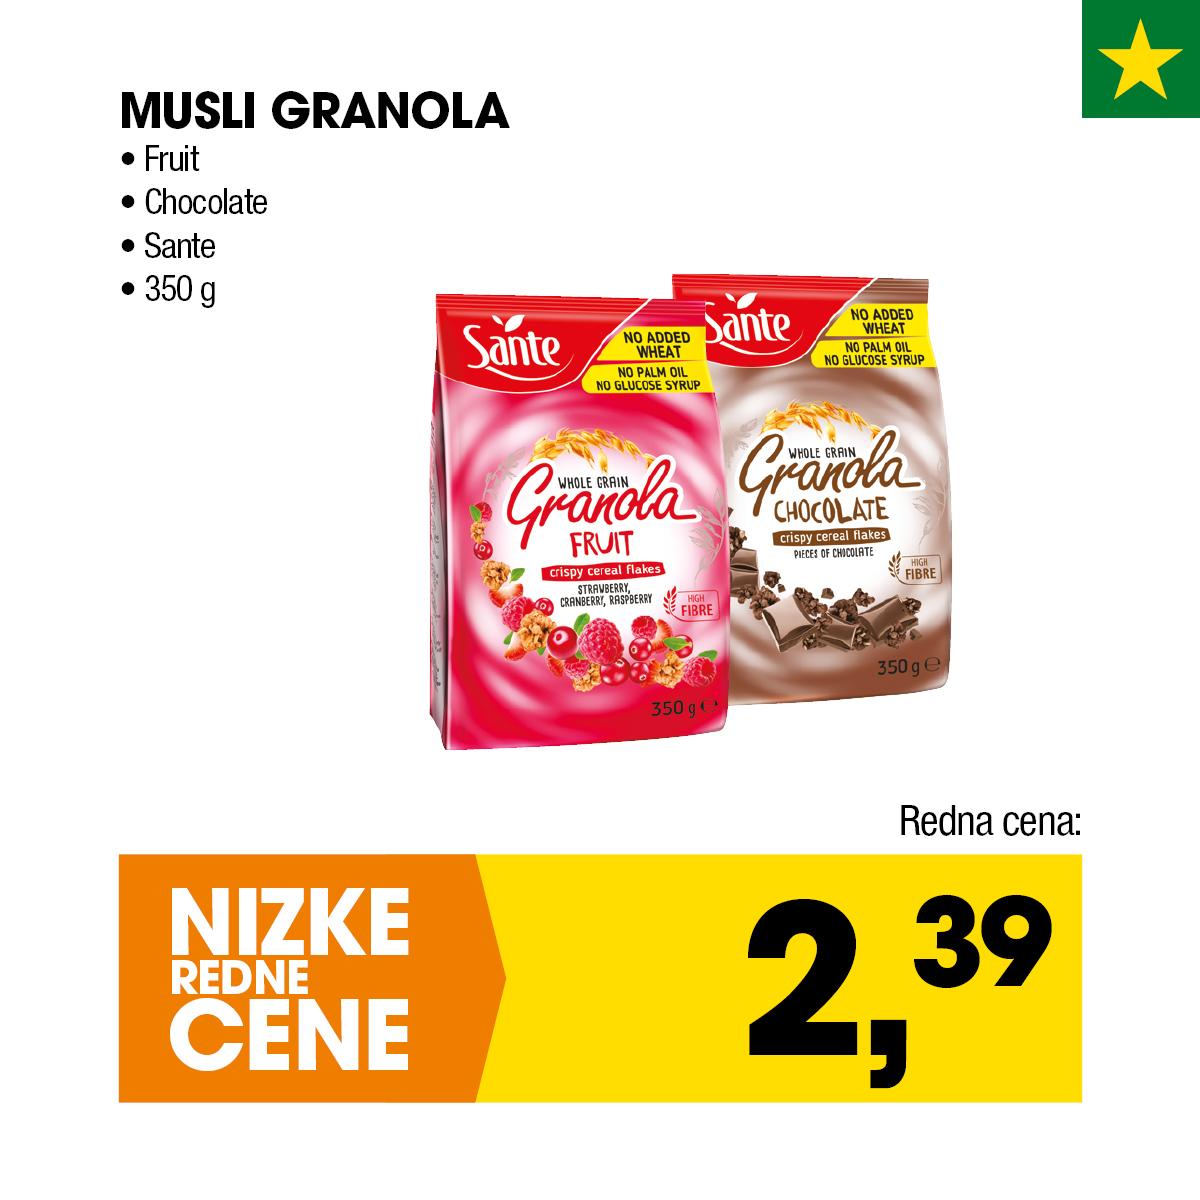 Fruit Chocolate Sante Musli Granola